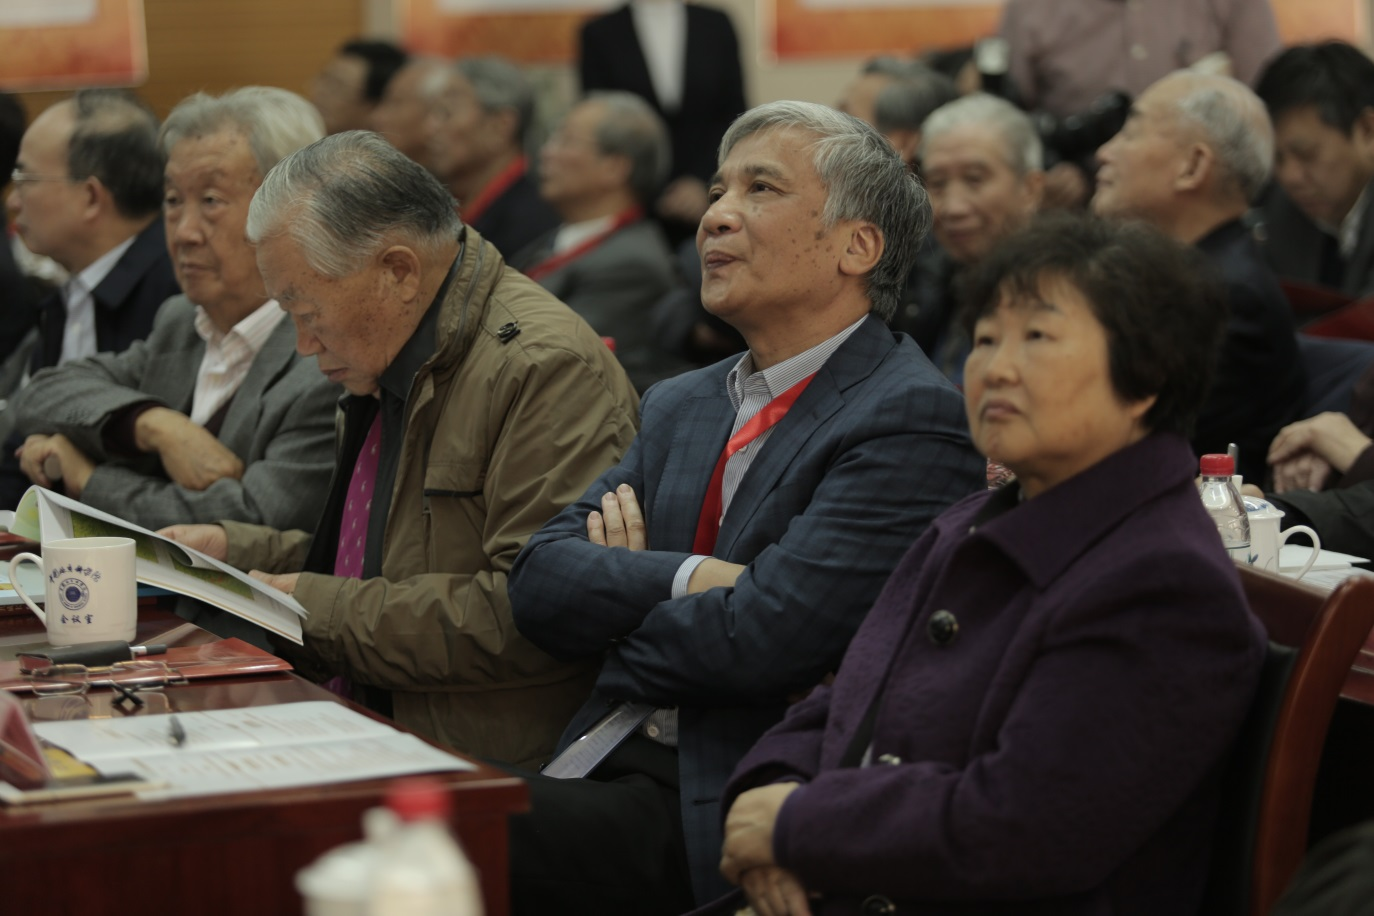 http://www.chinainperspective.com/EditBackyard/EditorData/Photo/2017/Feb/2172017D3.jpg